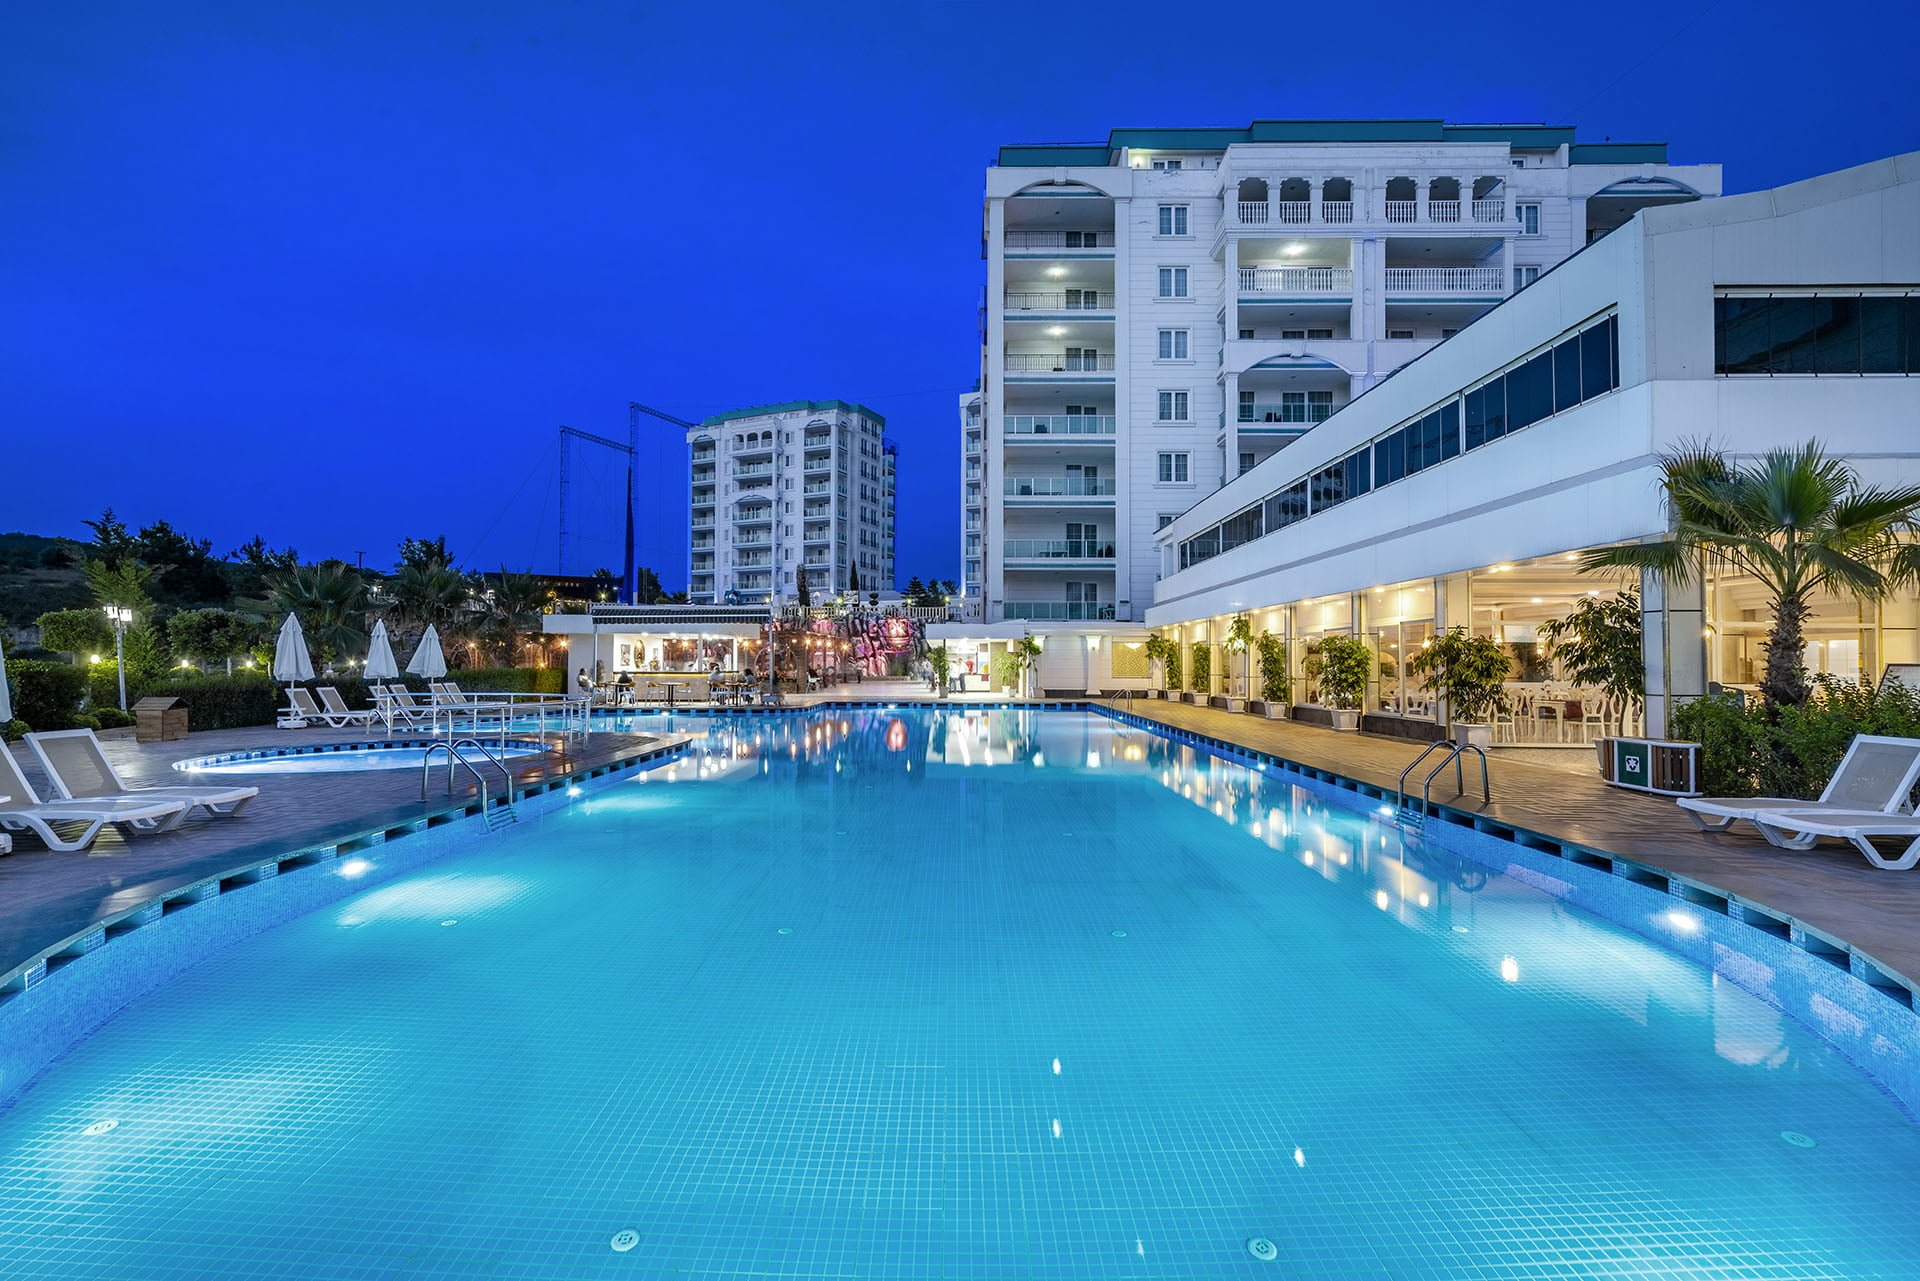 , Islamic Hotel Modern Palaces Halal Hotel & SPA Resort Alanya Turkey